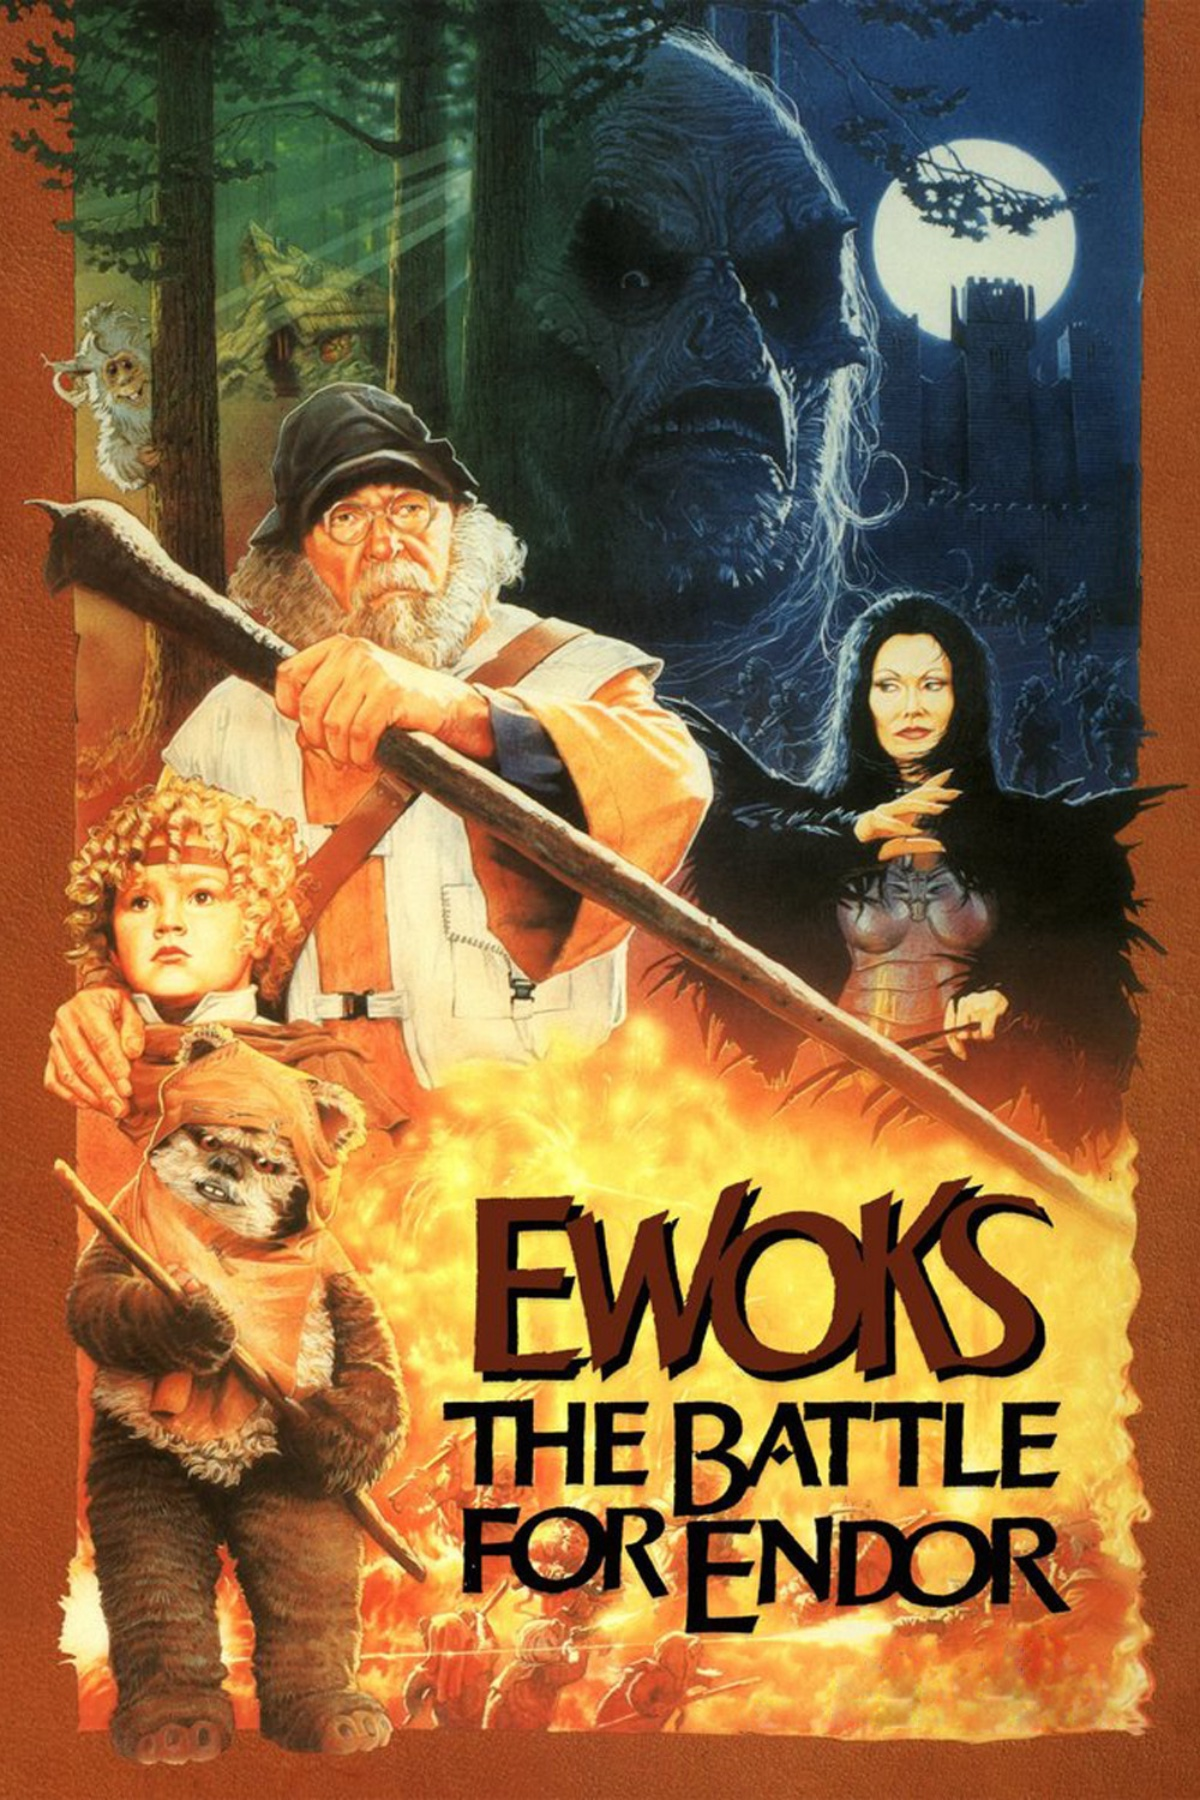 ewoks the battle for endor download